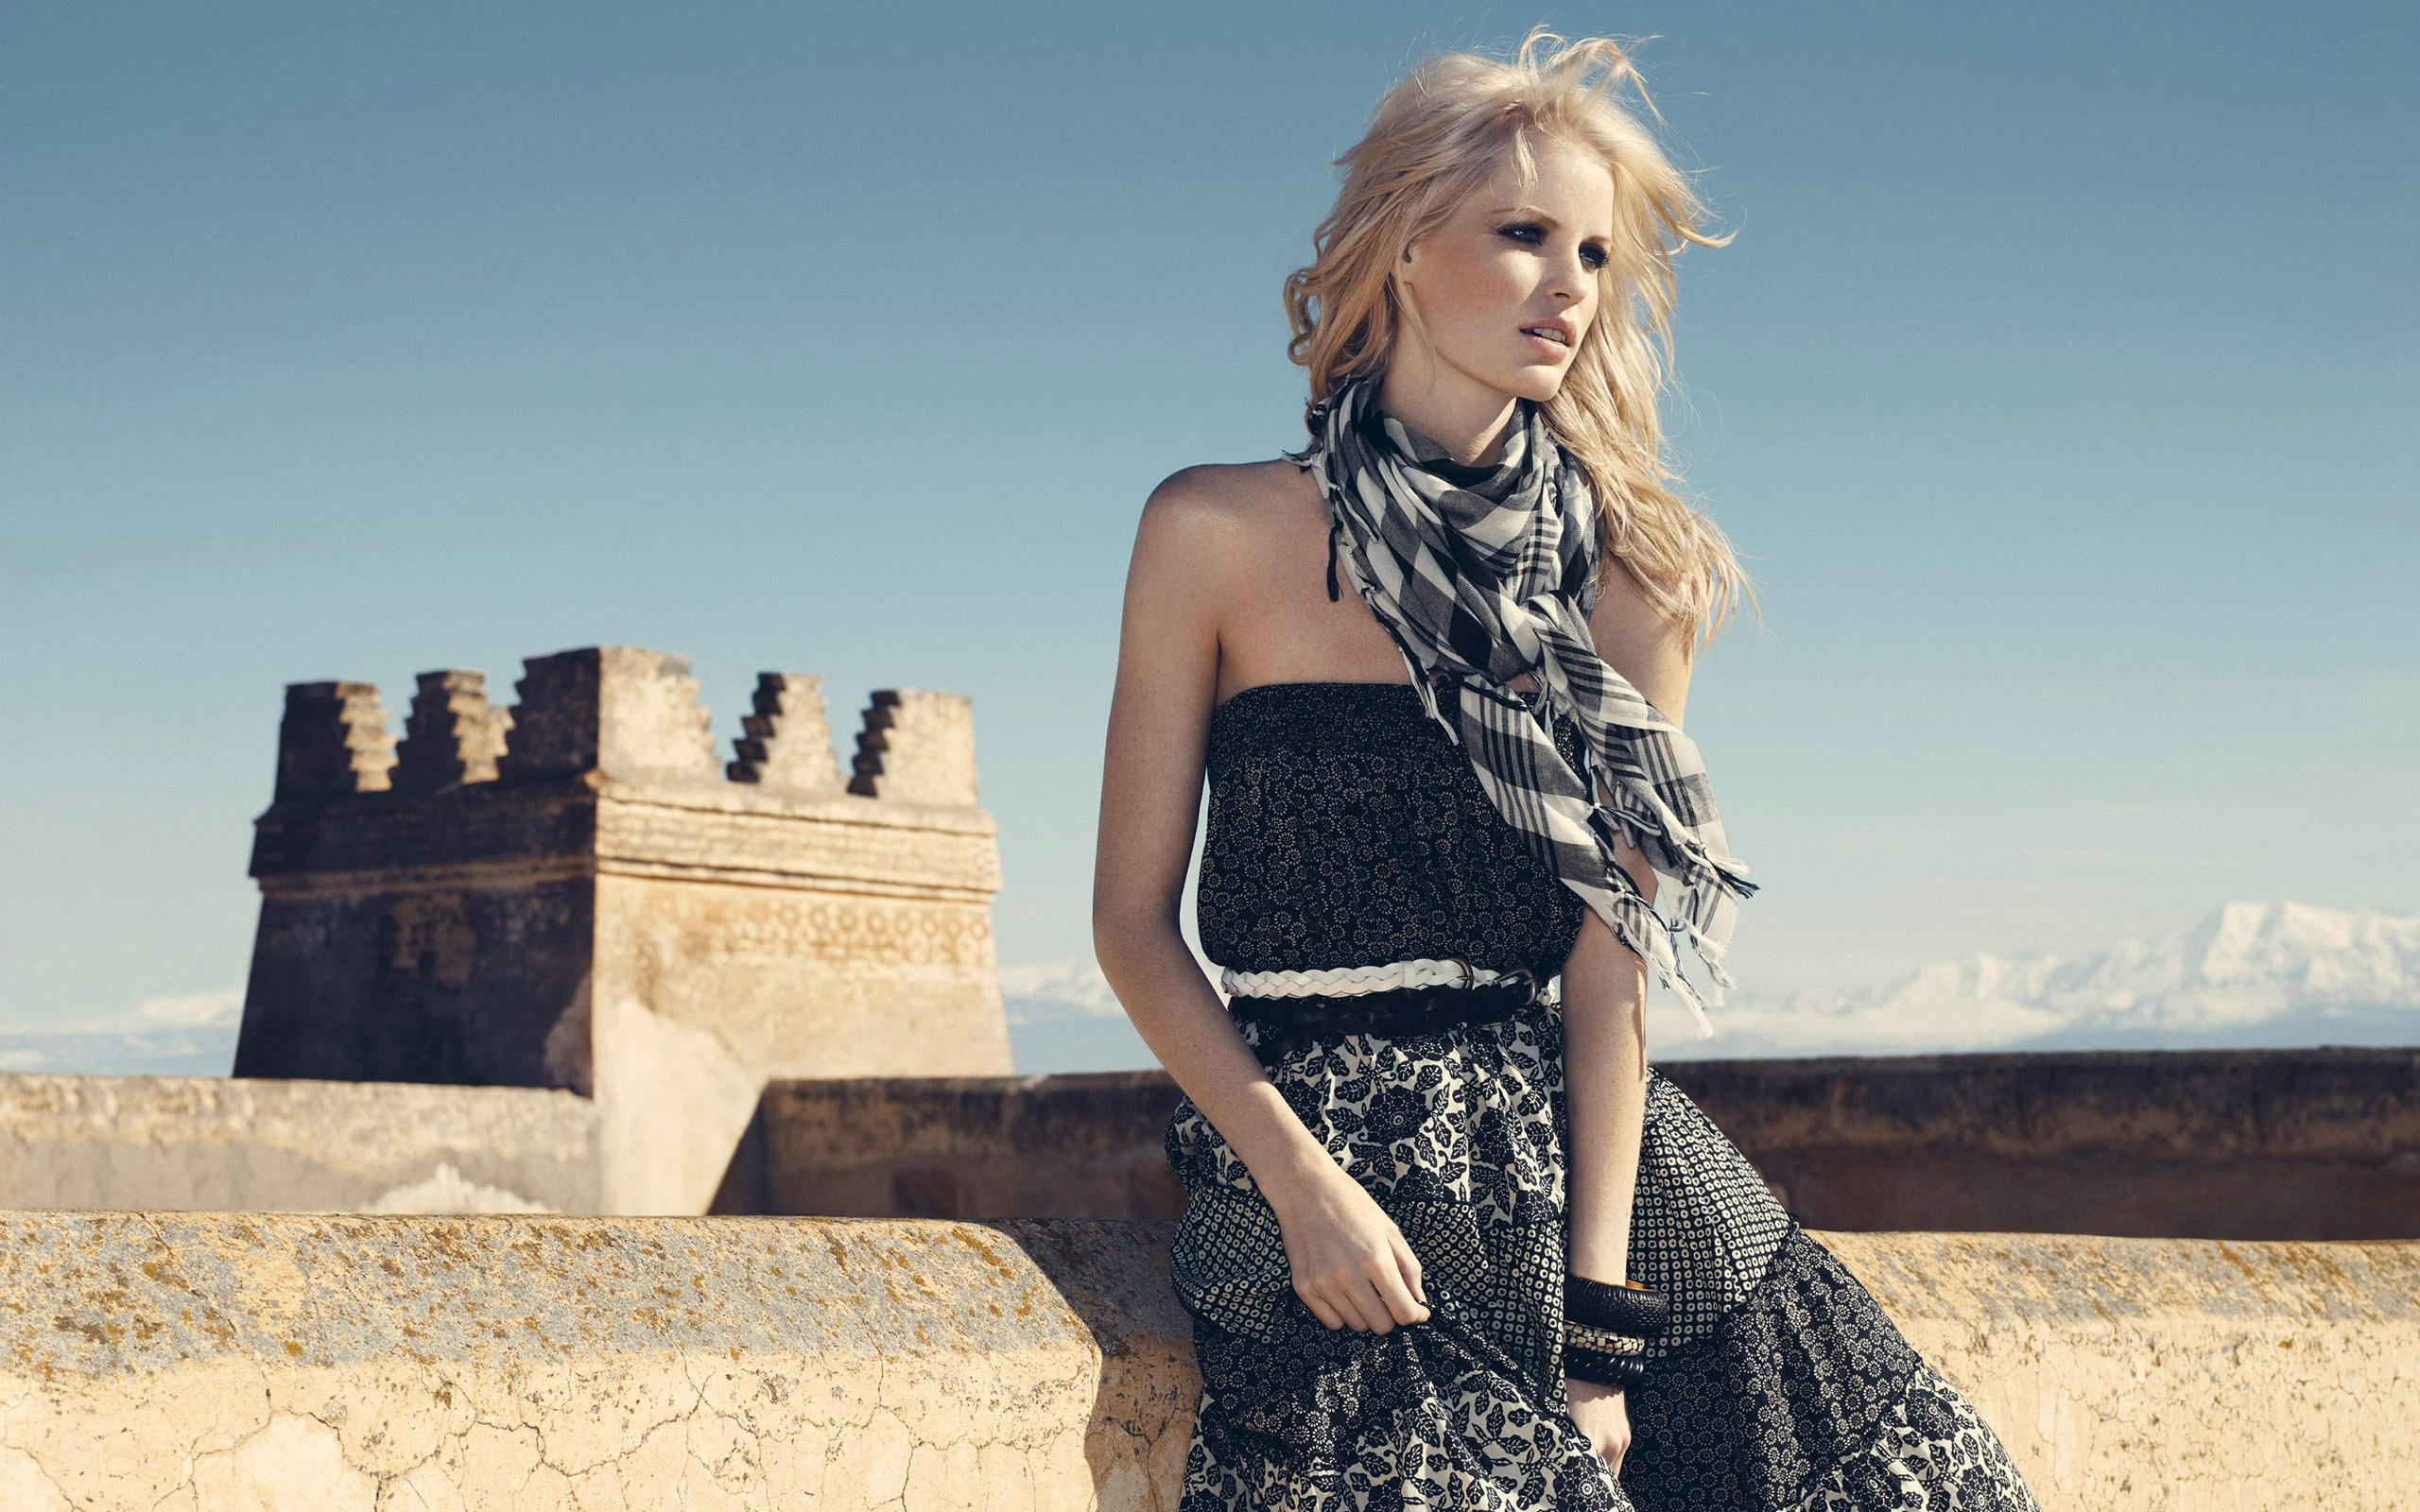 Fashion Photography HD Wallpaper 10 2560x1600